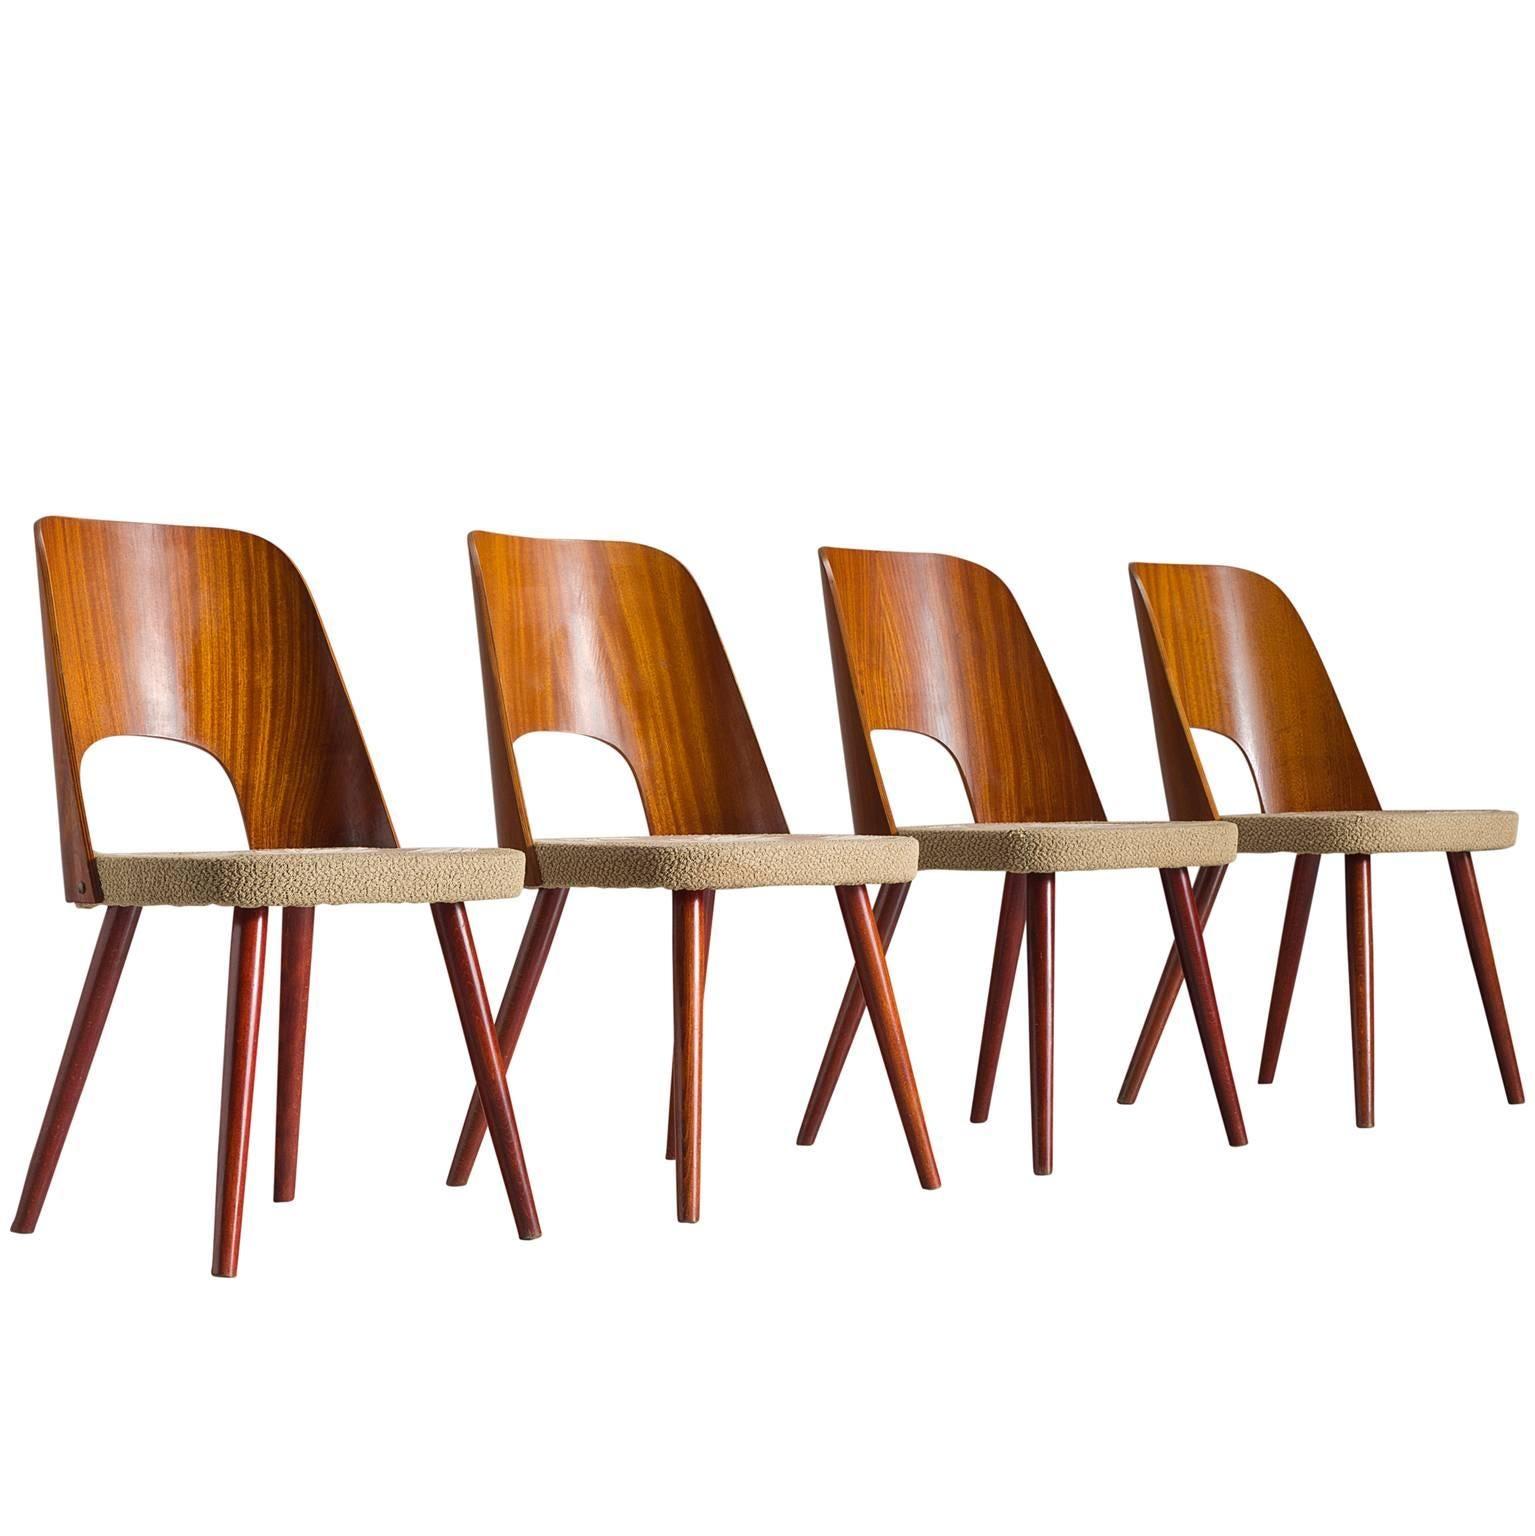 oswald haerdtl set of four bent chairs for thonet 1